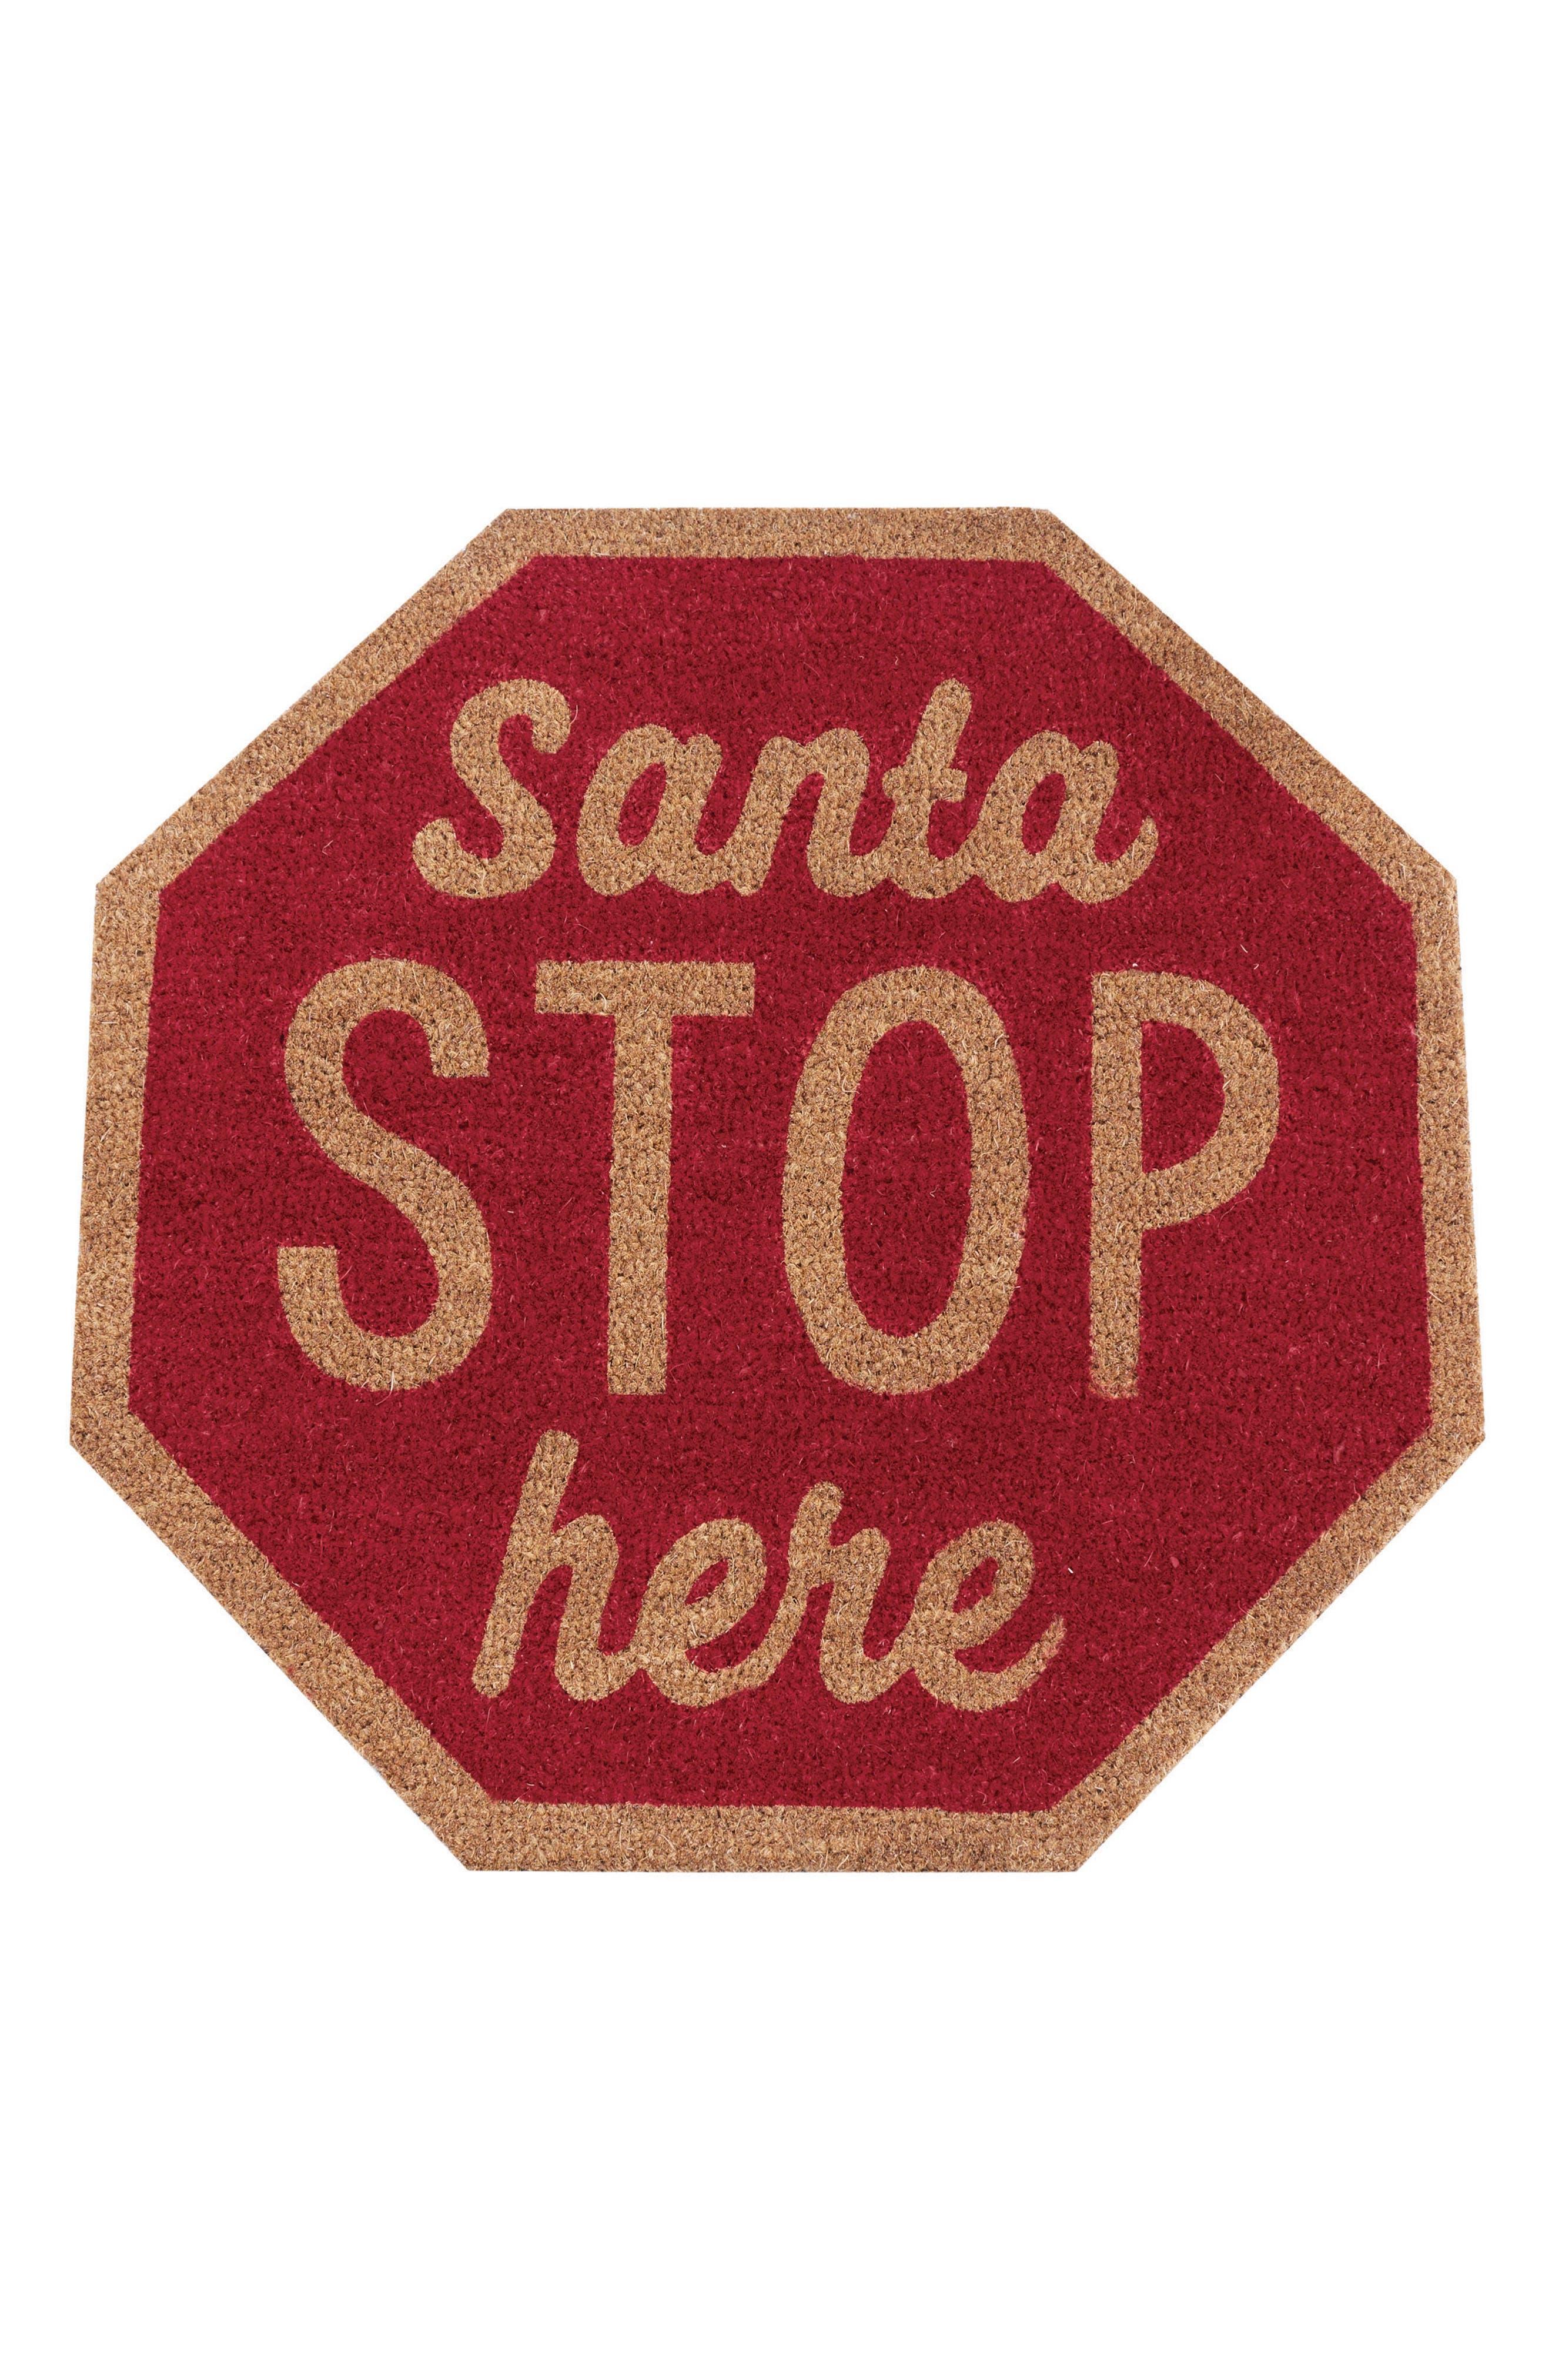 Main Image - Mud Pie Santa Stop Here Coir Door Mat